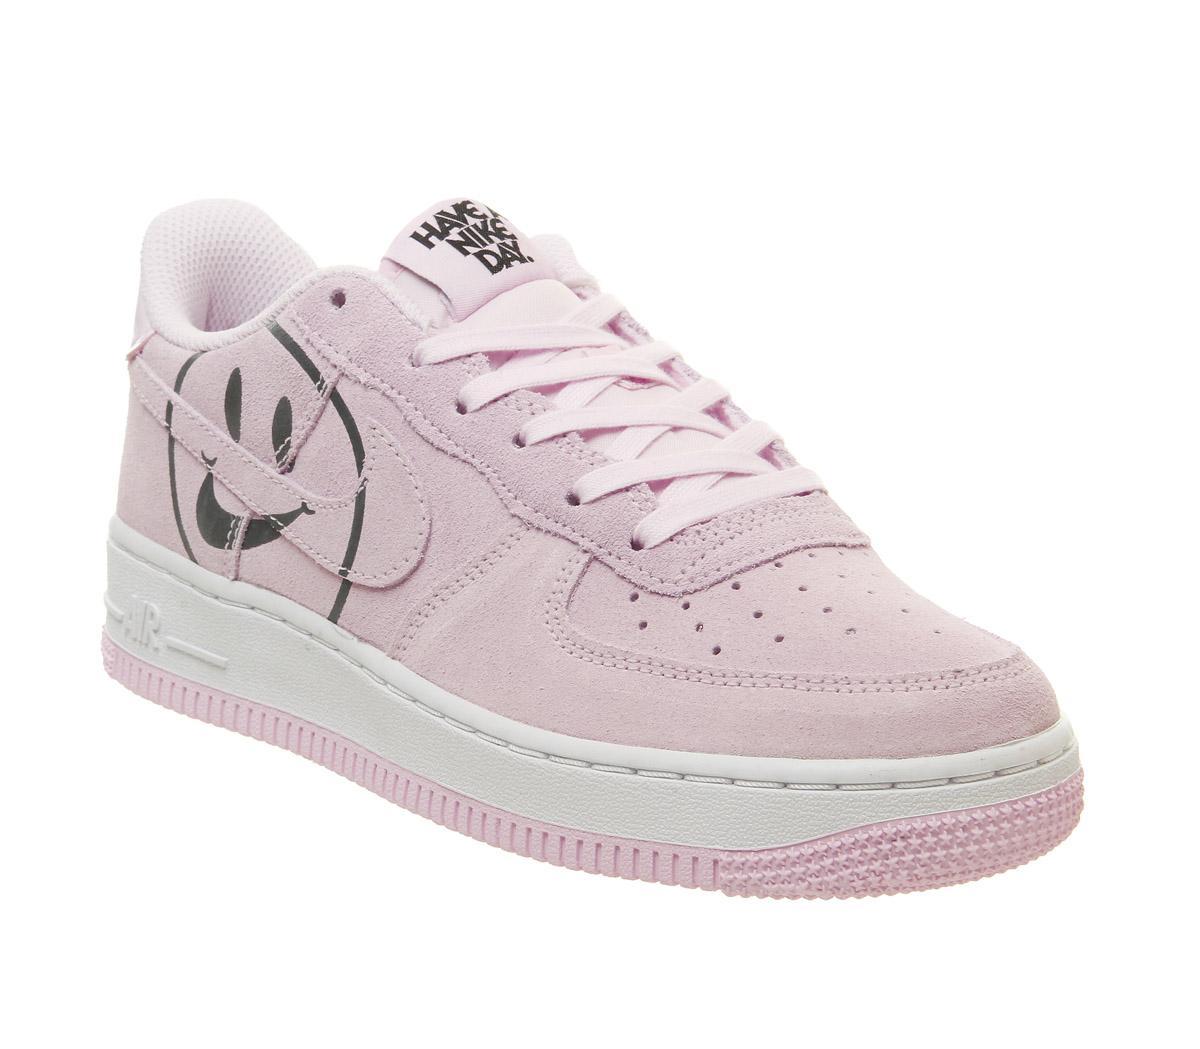 Nike Air Force 1 Trainers Pink Foam